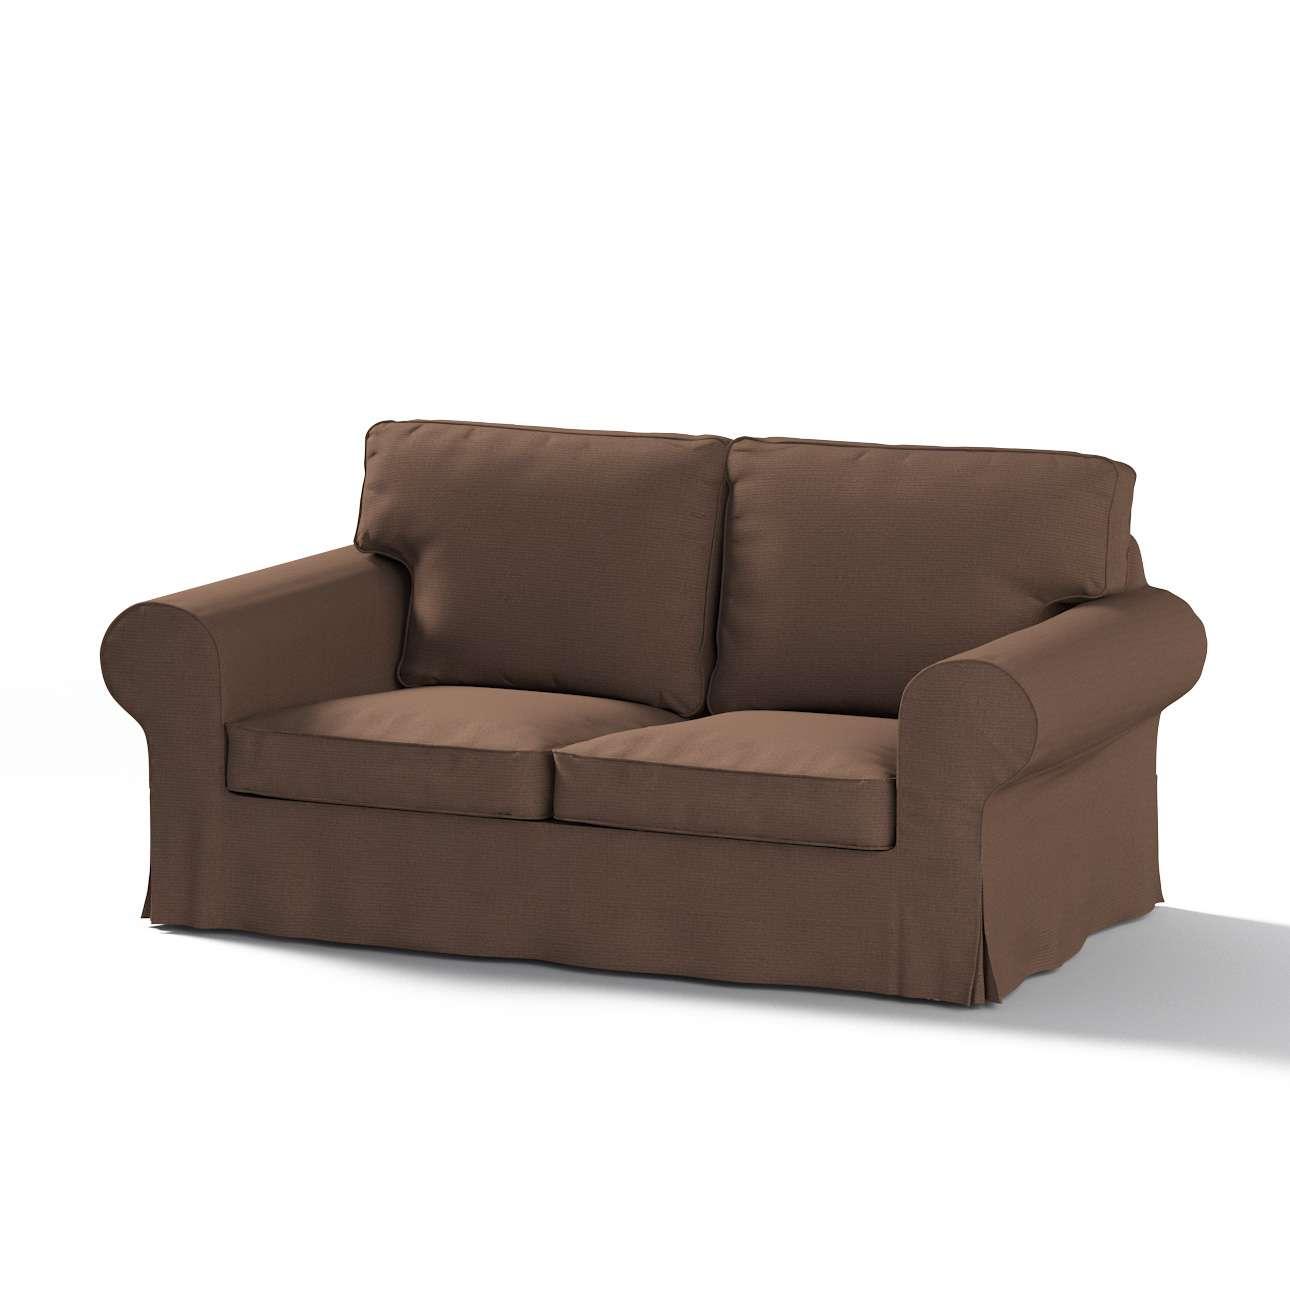 Ektorp 2-Sitzer Schlafsofabezug  ALTES Modell Sofabezug Ektorp 2-Sitzer Schlafsofa altes Modell von der Kollektion Etna, Stoff: 705-08